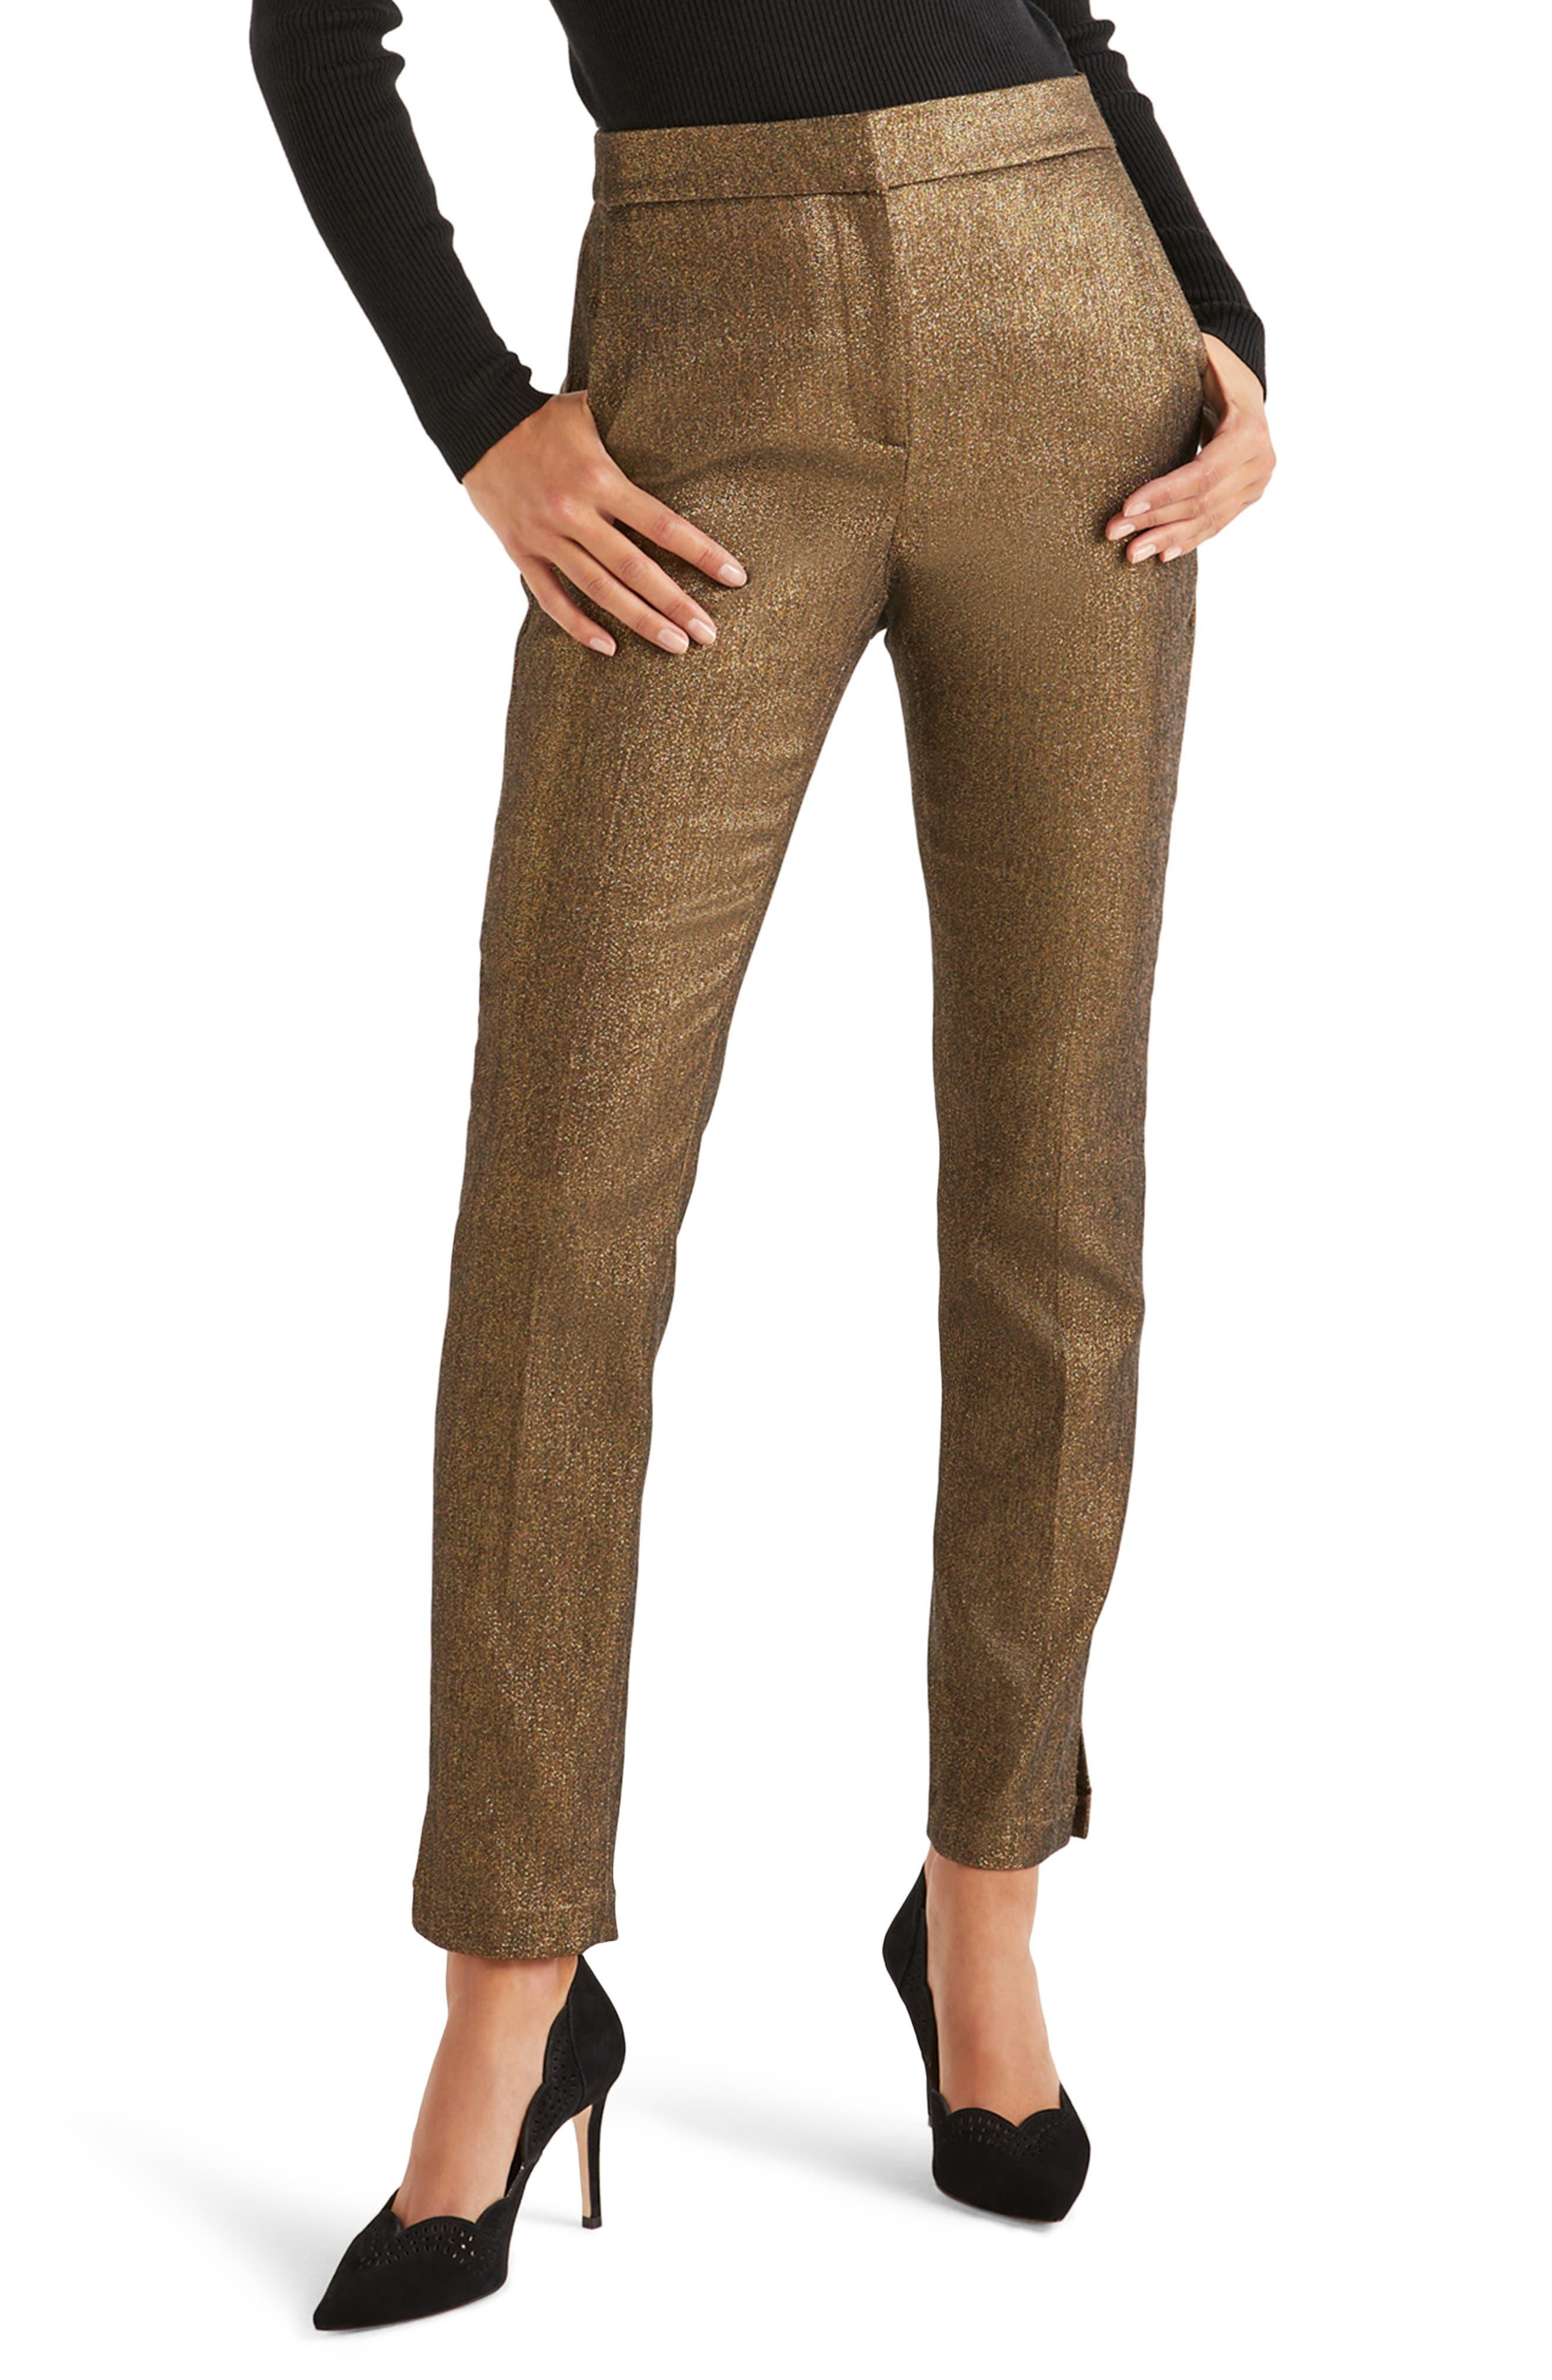 Boden Metallic Ankle Pants